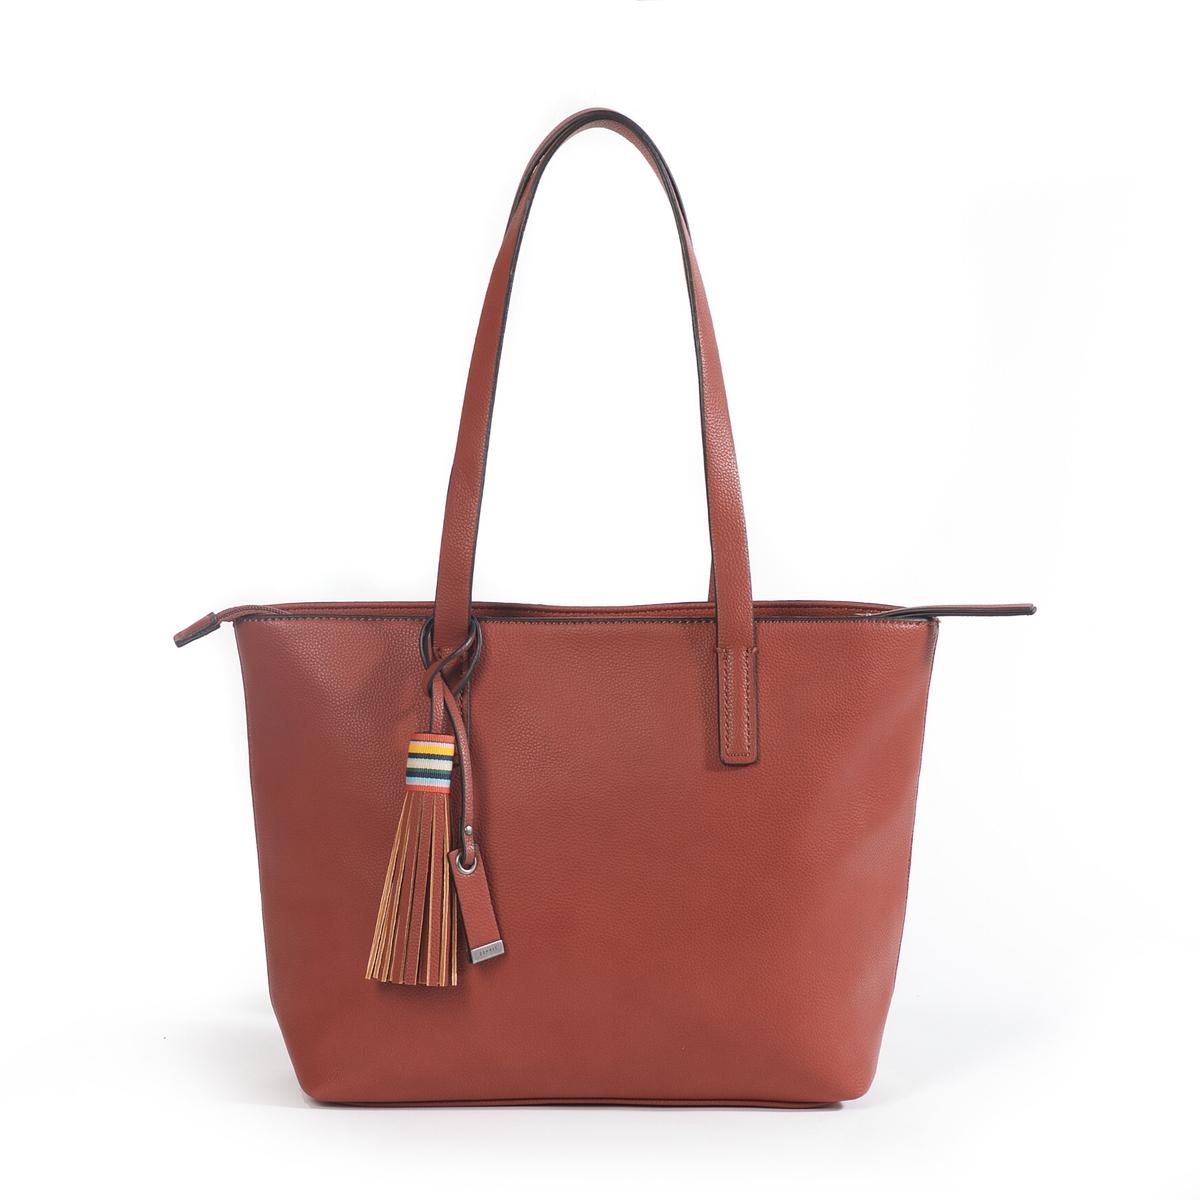 Сумка-шоппер Wendy сумка esprit cc6010f 469